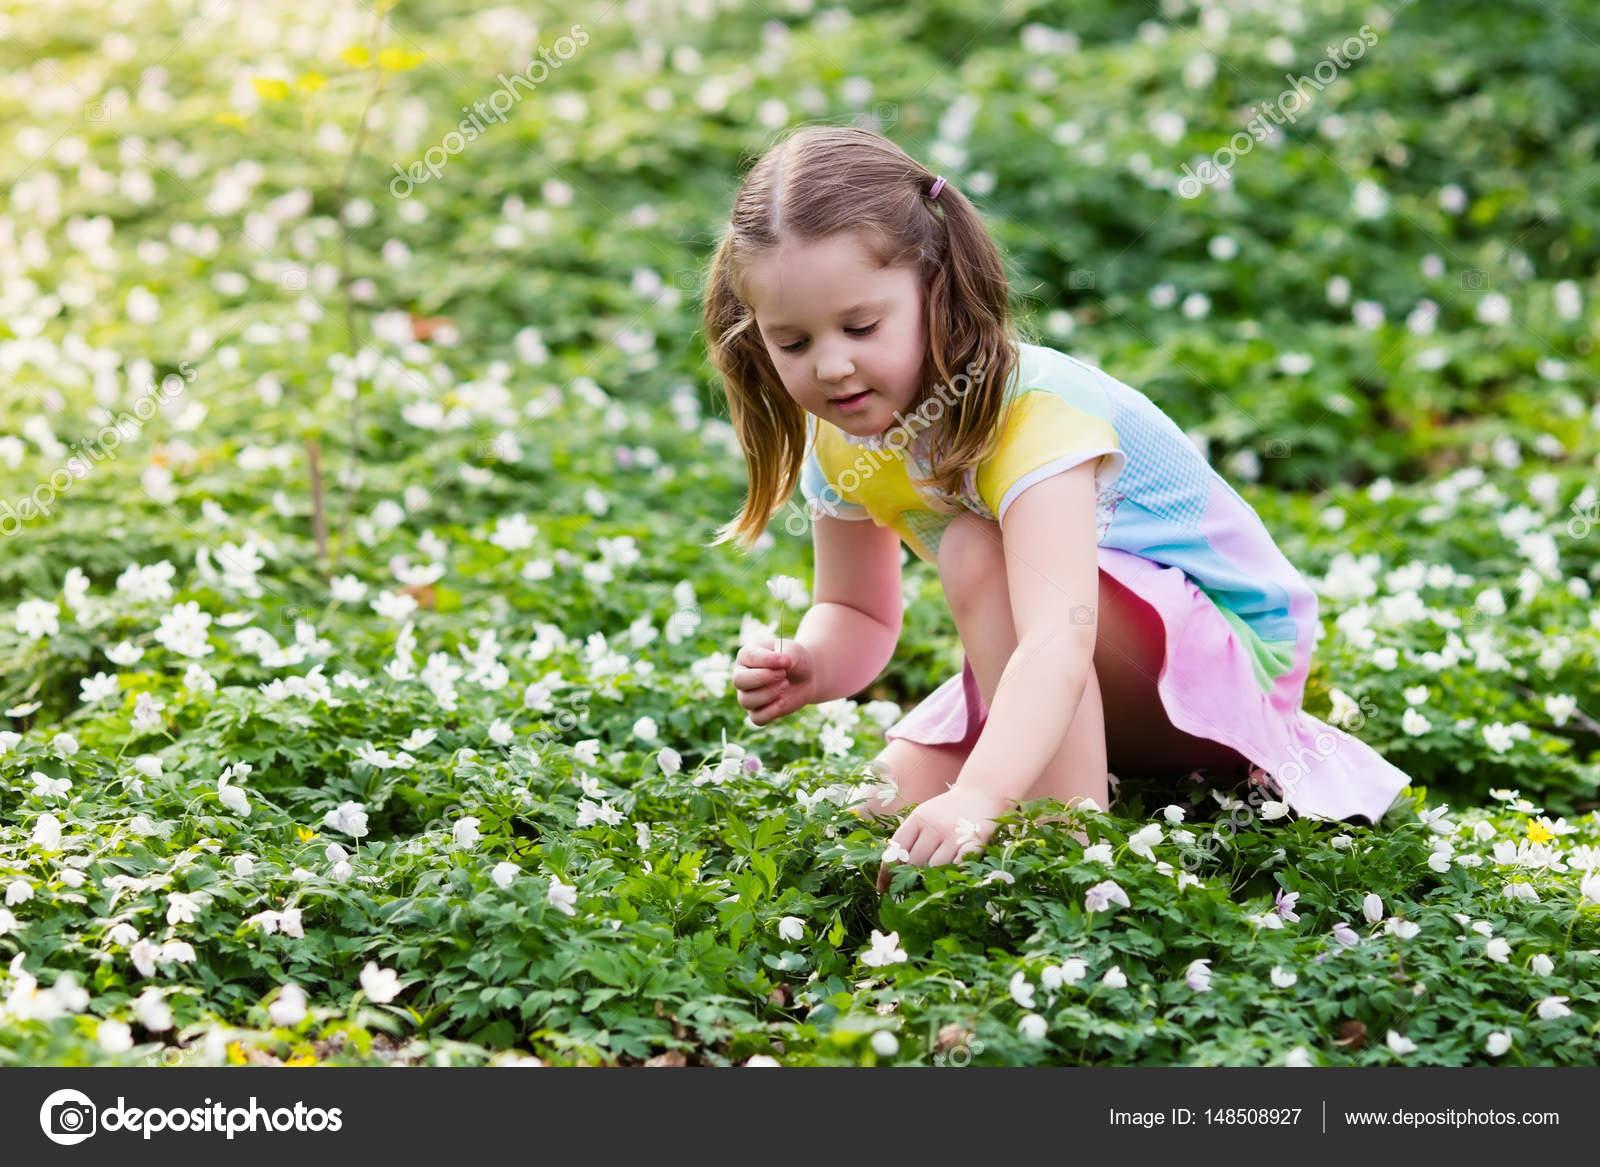 Child In Spring Park With Flowers Stock Photo Famveldman 148508927